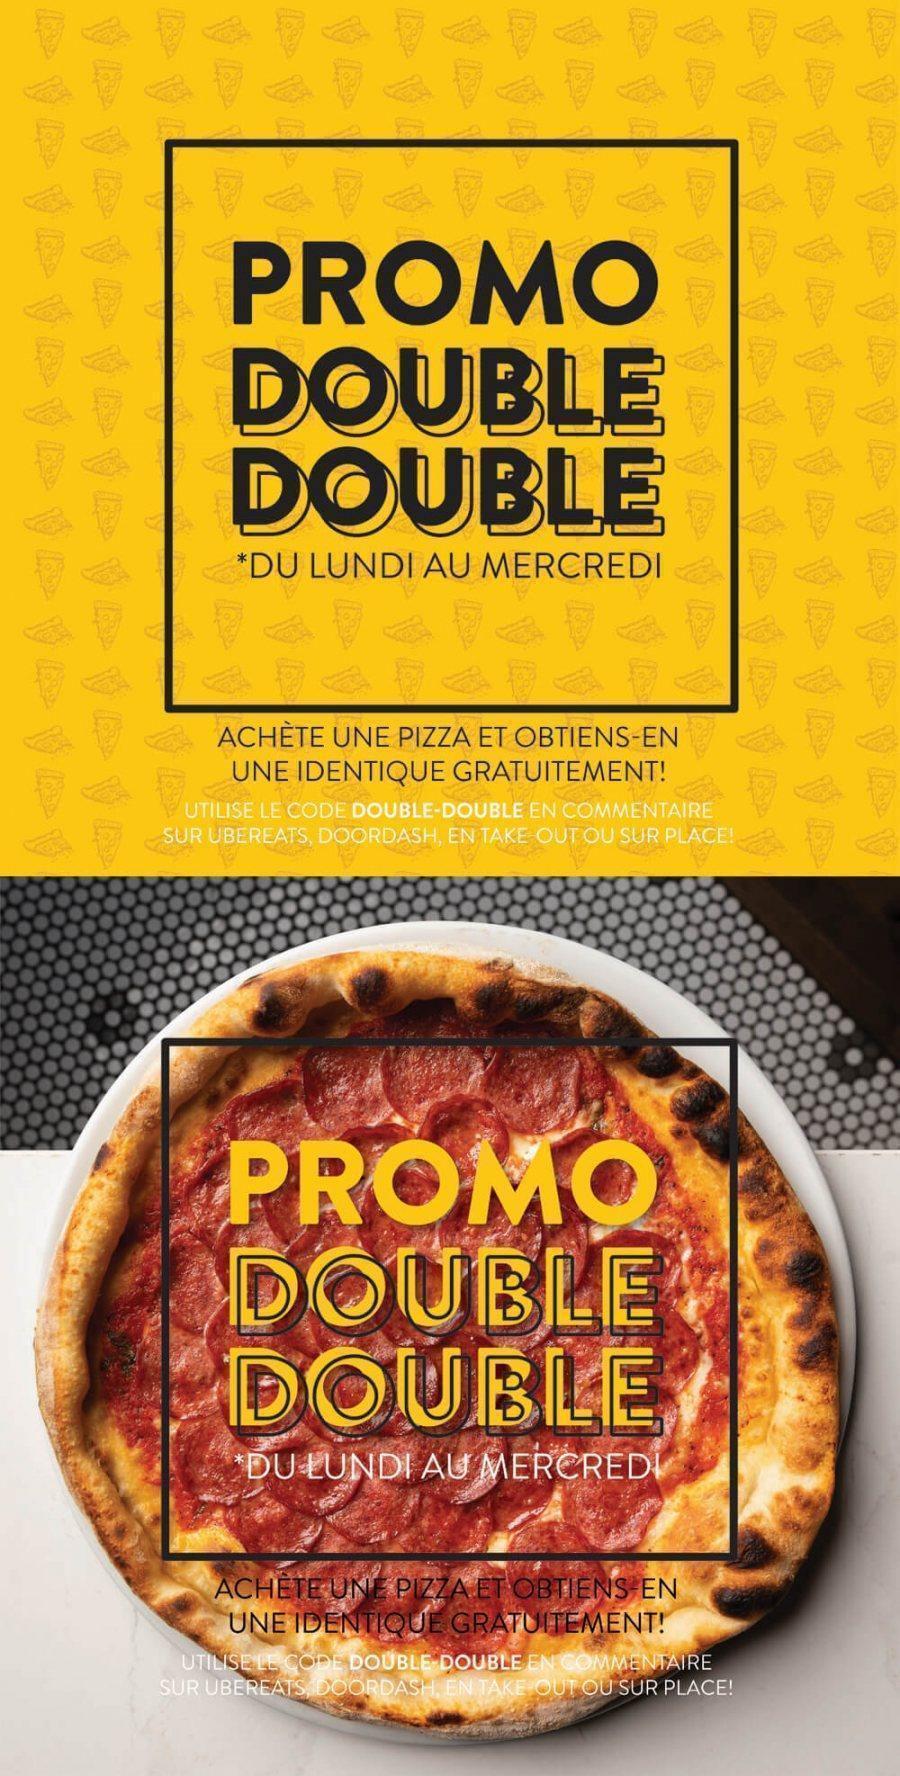 double-double_photo-_1